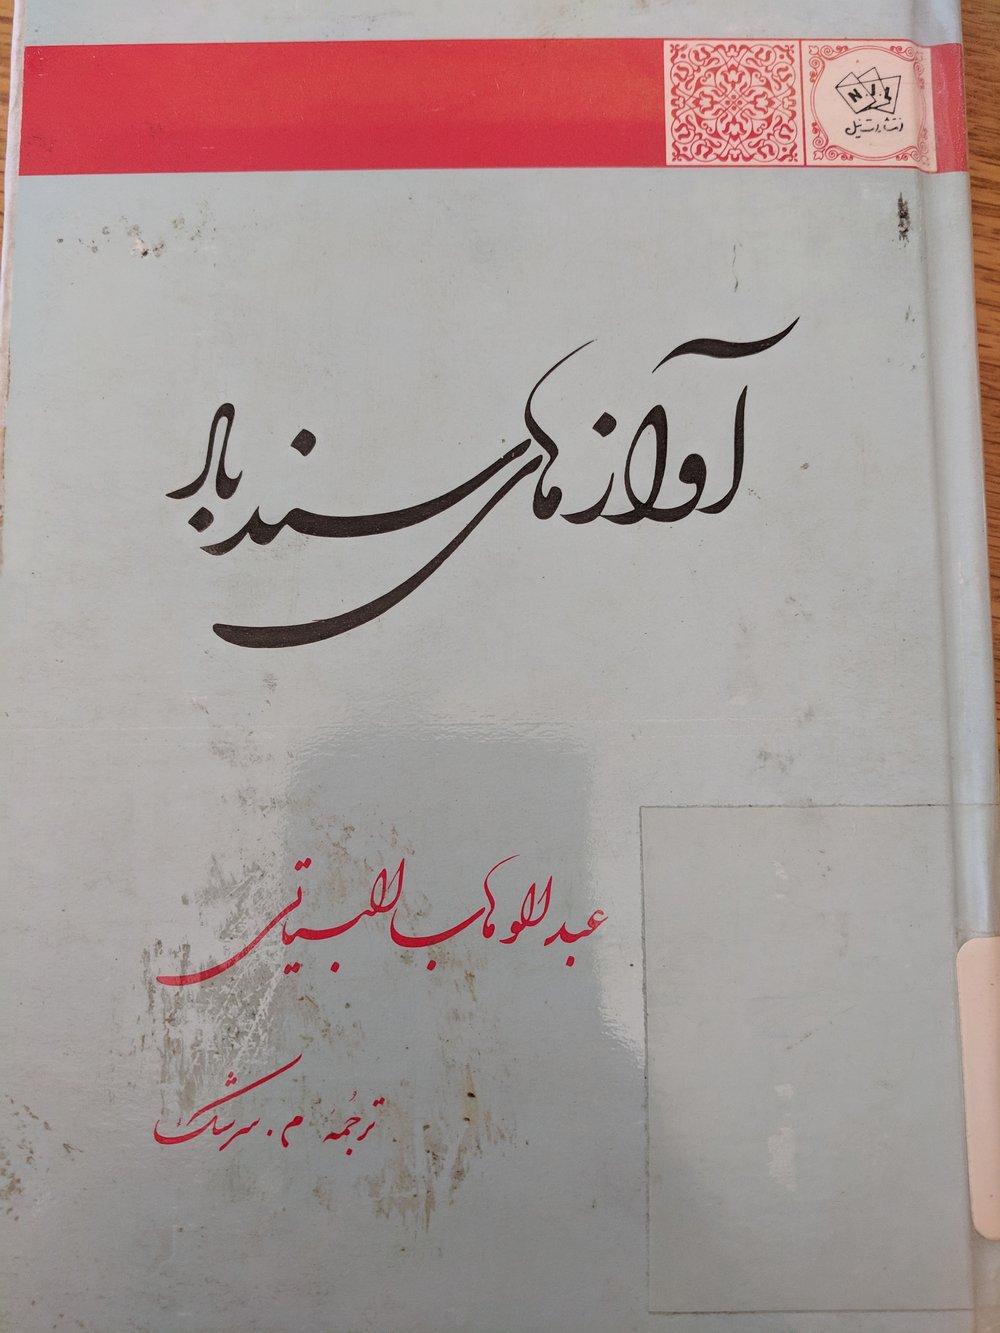 Shafīʿī-Kadkanī's translations of ʿAbd al-Wahhāb al-Bayātī's poetry.